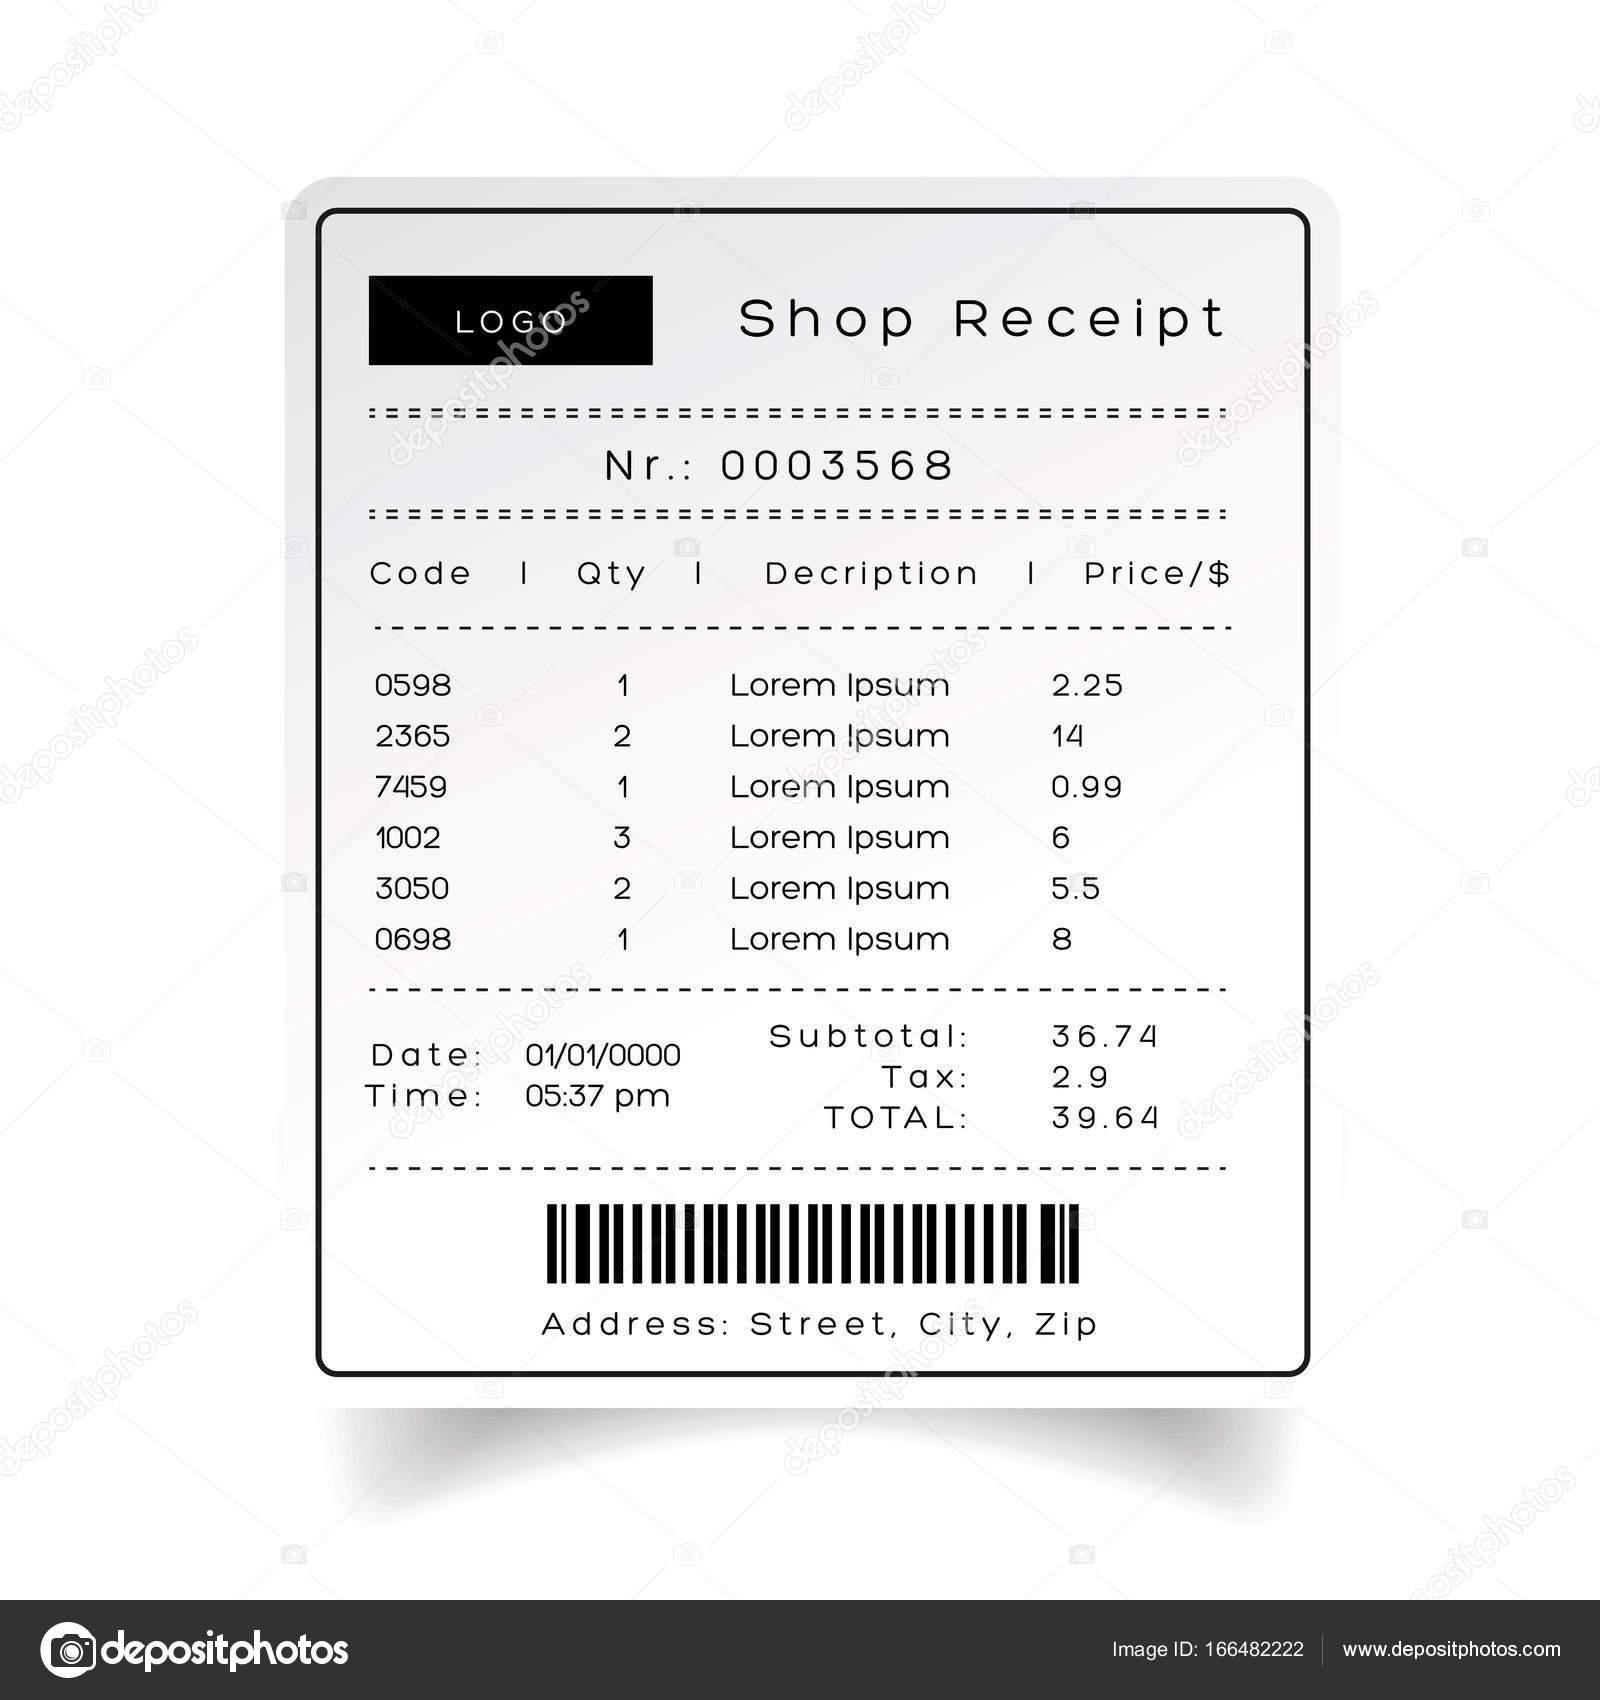 Shop Eingang Vorlage Vektor — Stockvektor © Grounder #166482222